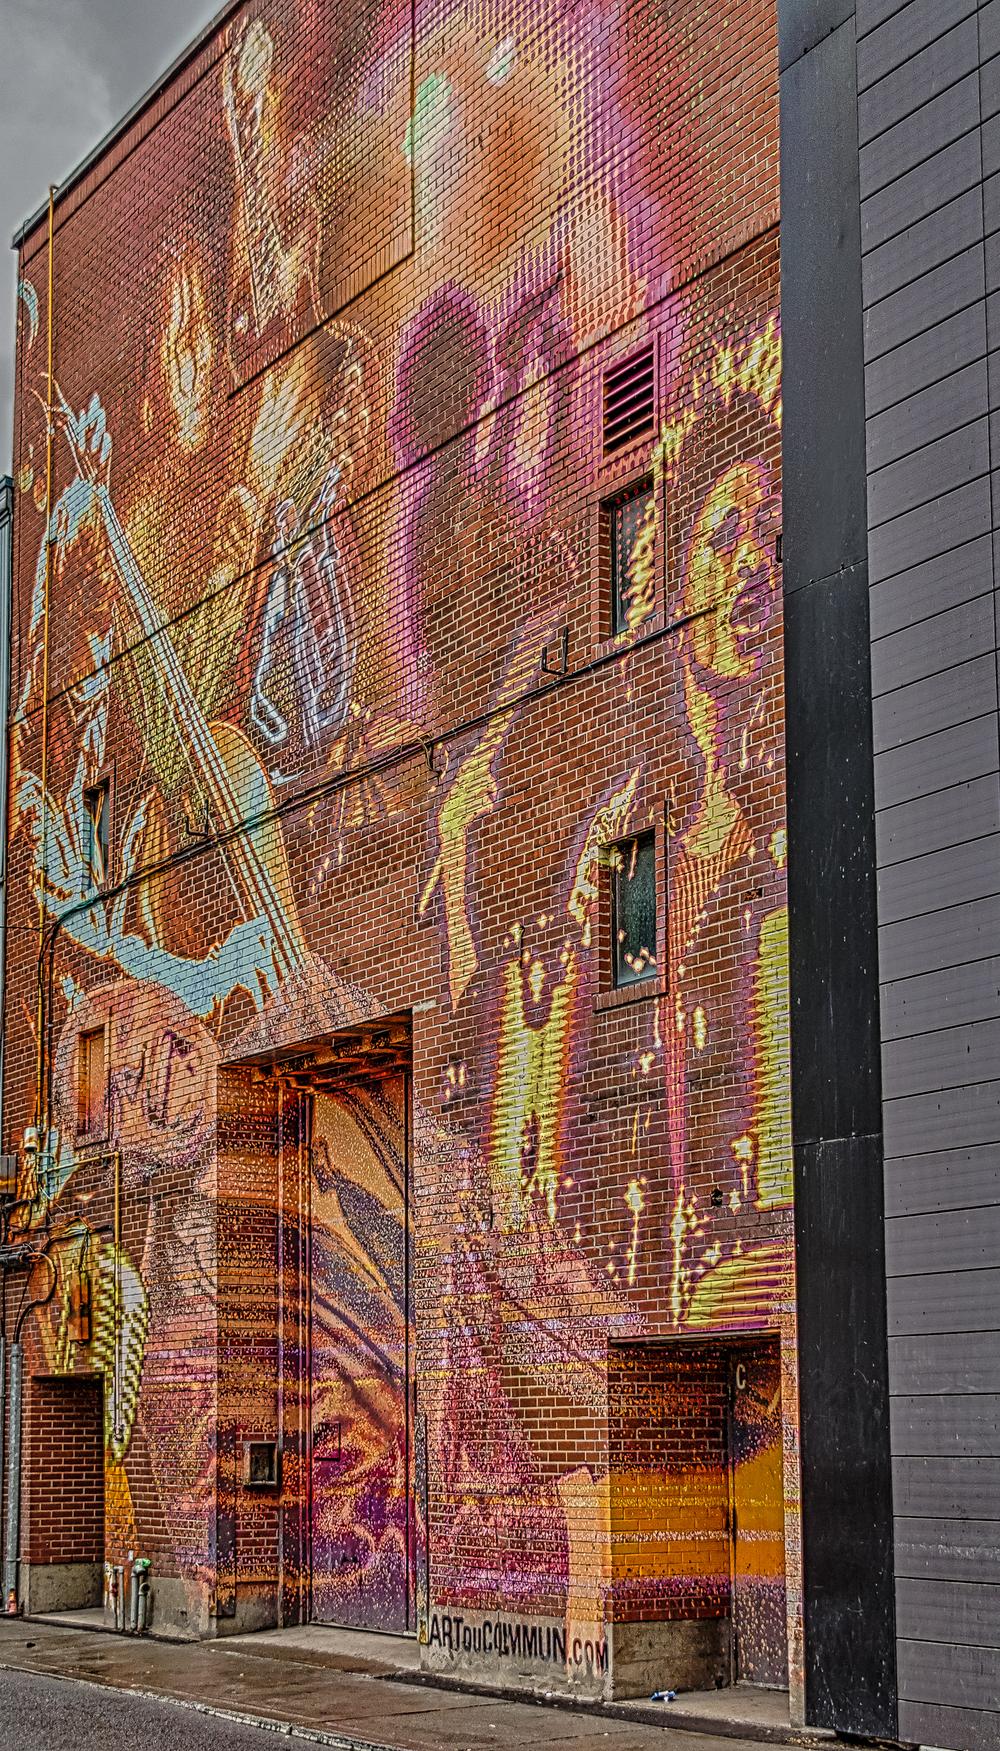 20140816_Grafitti and Architechture - Latin Quarter_IMG_5666_HDR-M.jpg